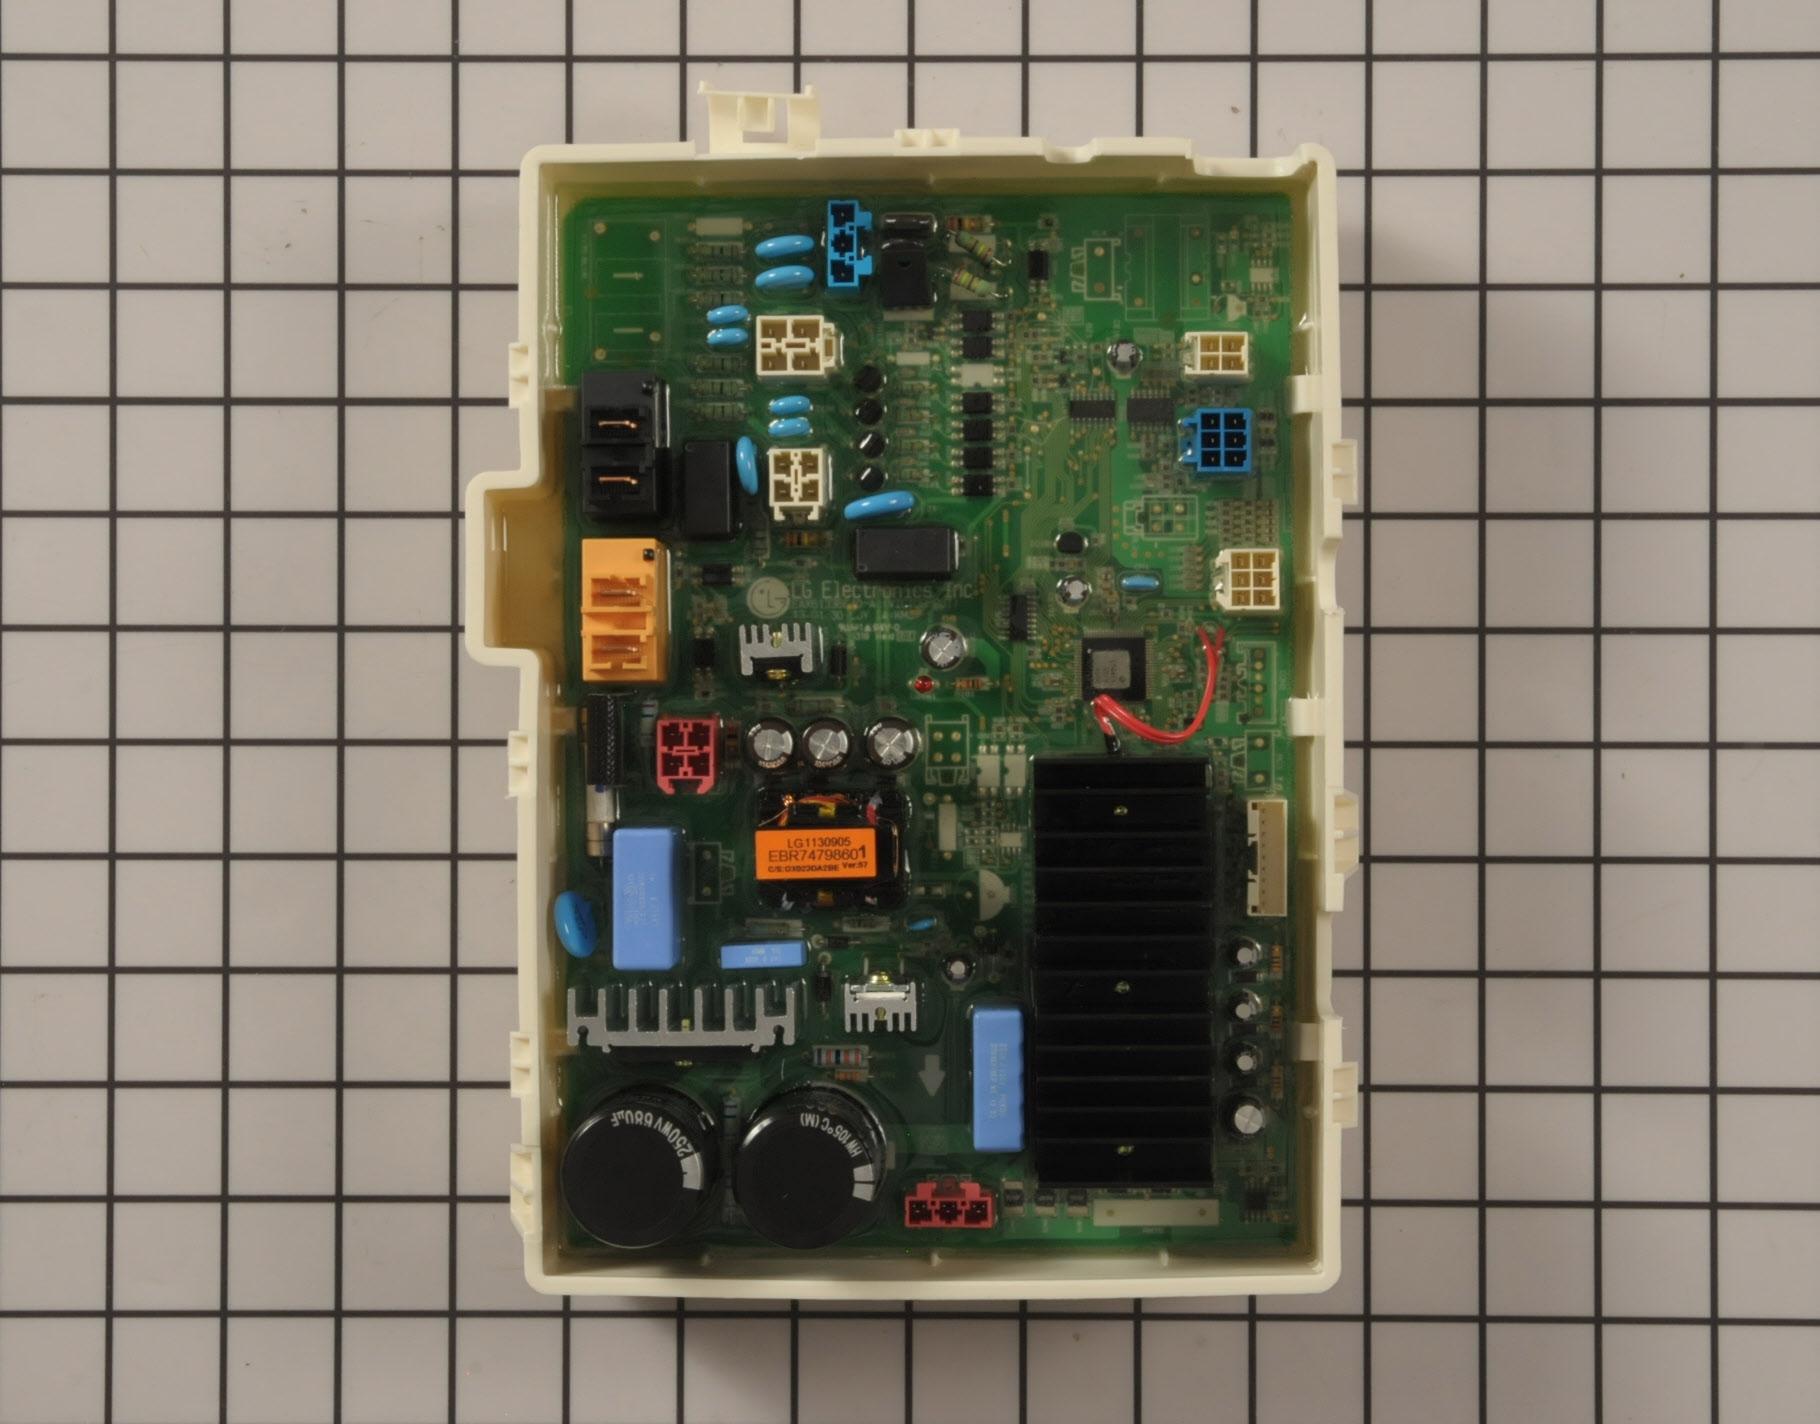 LG Washing Machine Part # EBR78263901 - Main Control Board